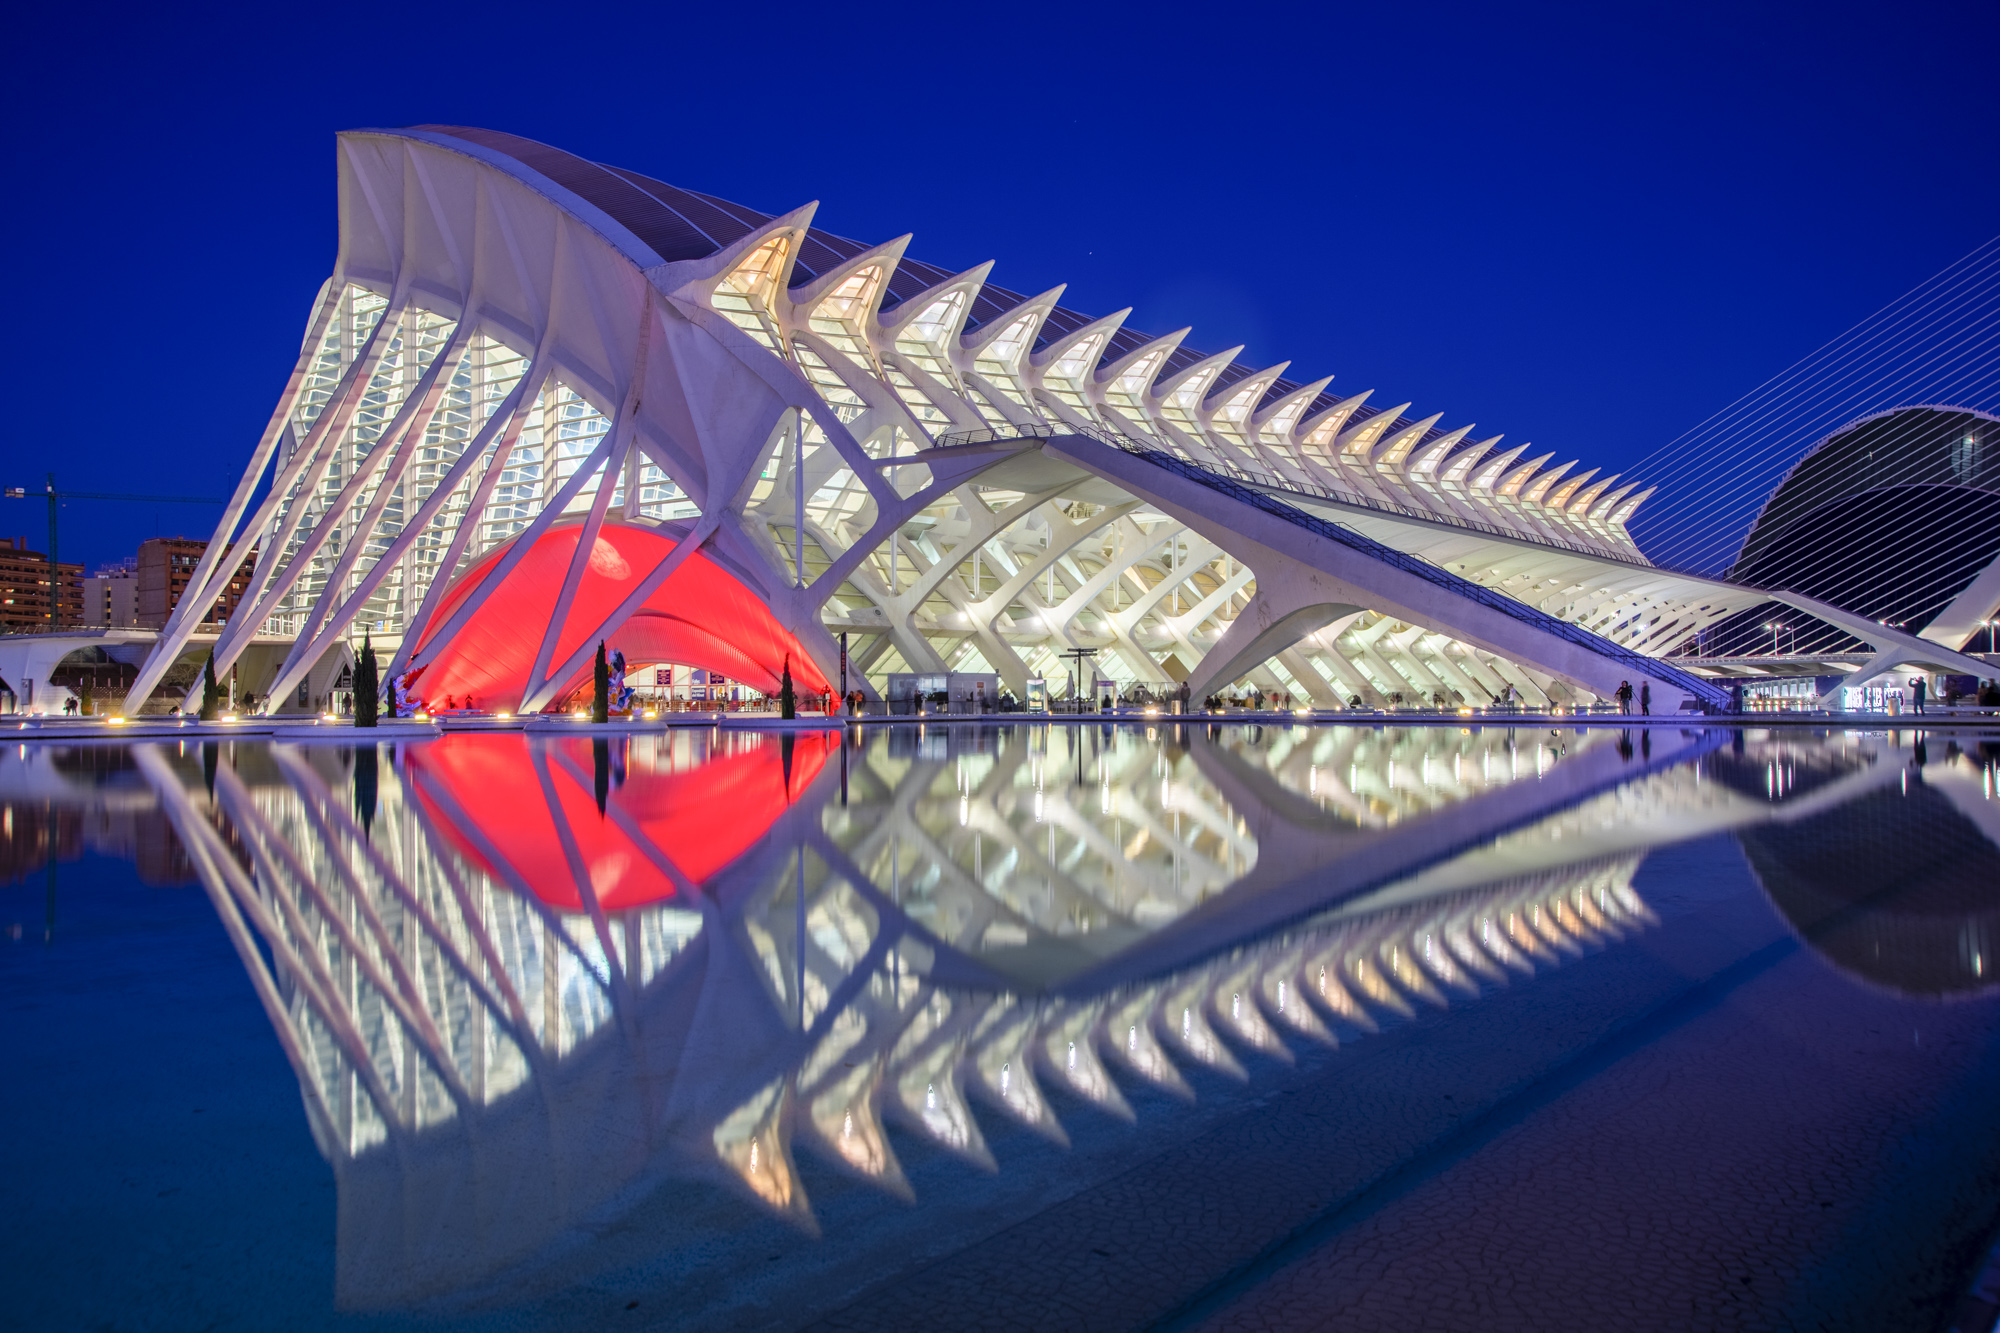 Spanien, Valencia, Ciutat de les Arts i les Ciències, Stadt der Künste und Wissenschaften,